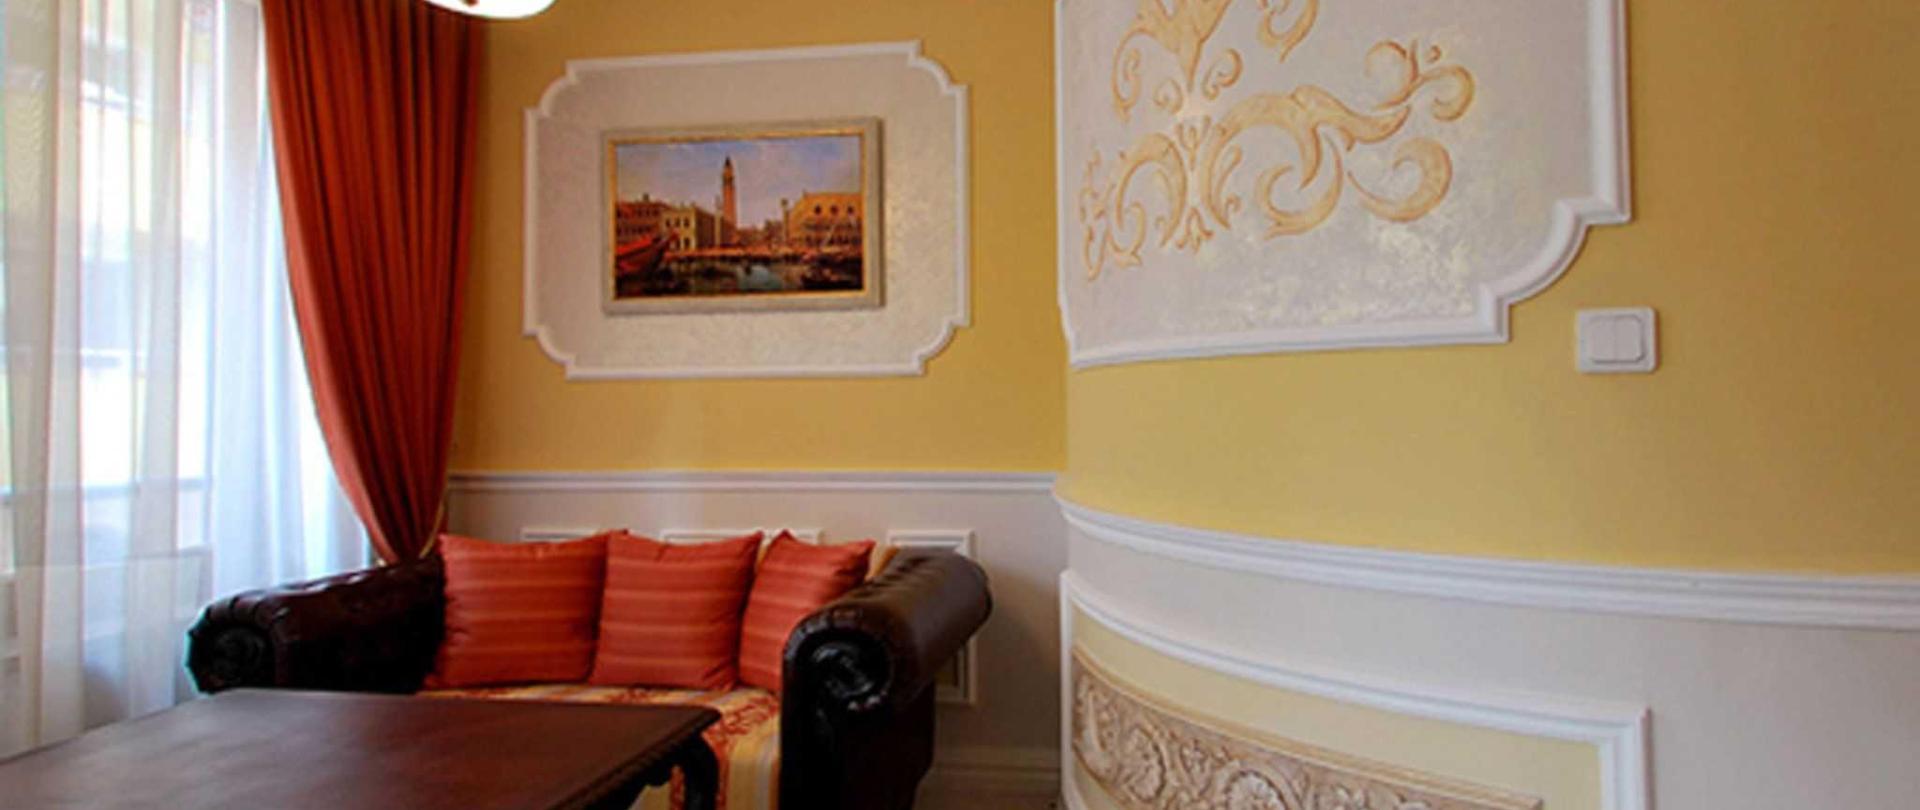 hotel_apartment_living_room_4.jpg